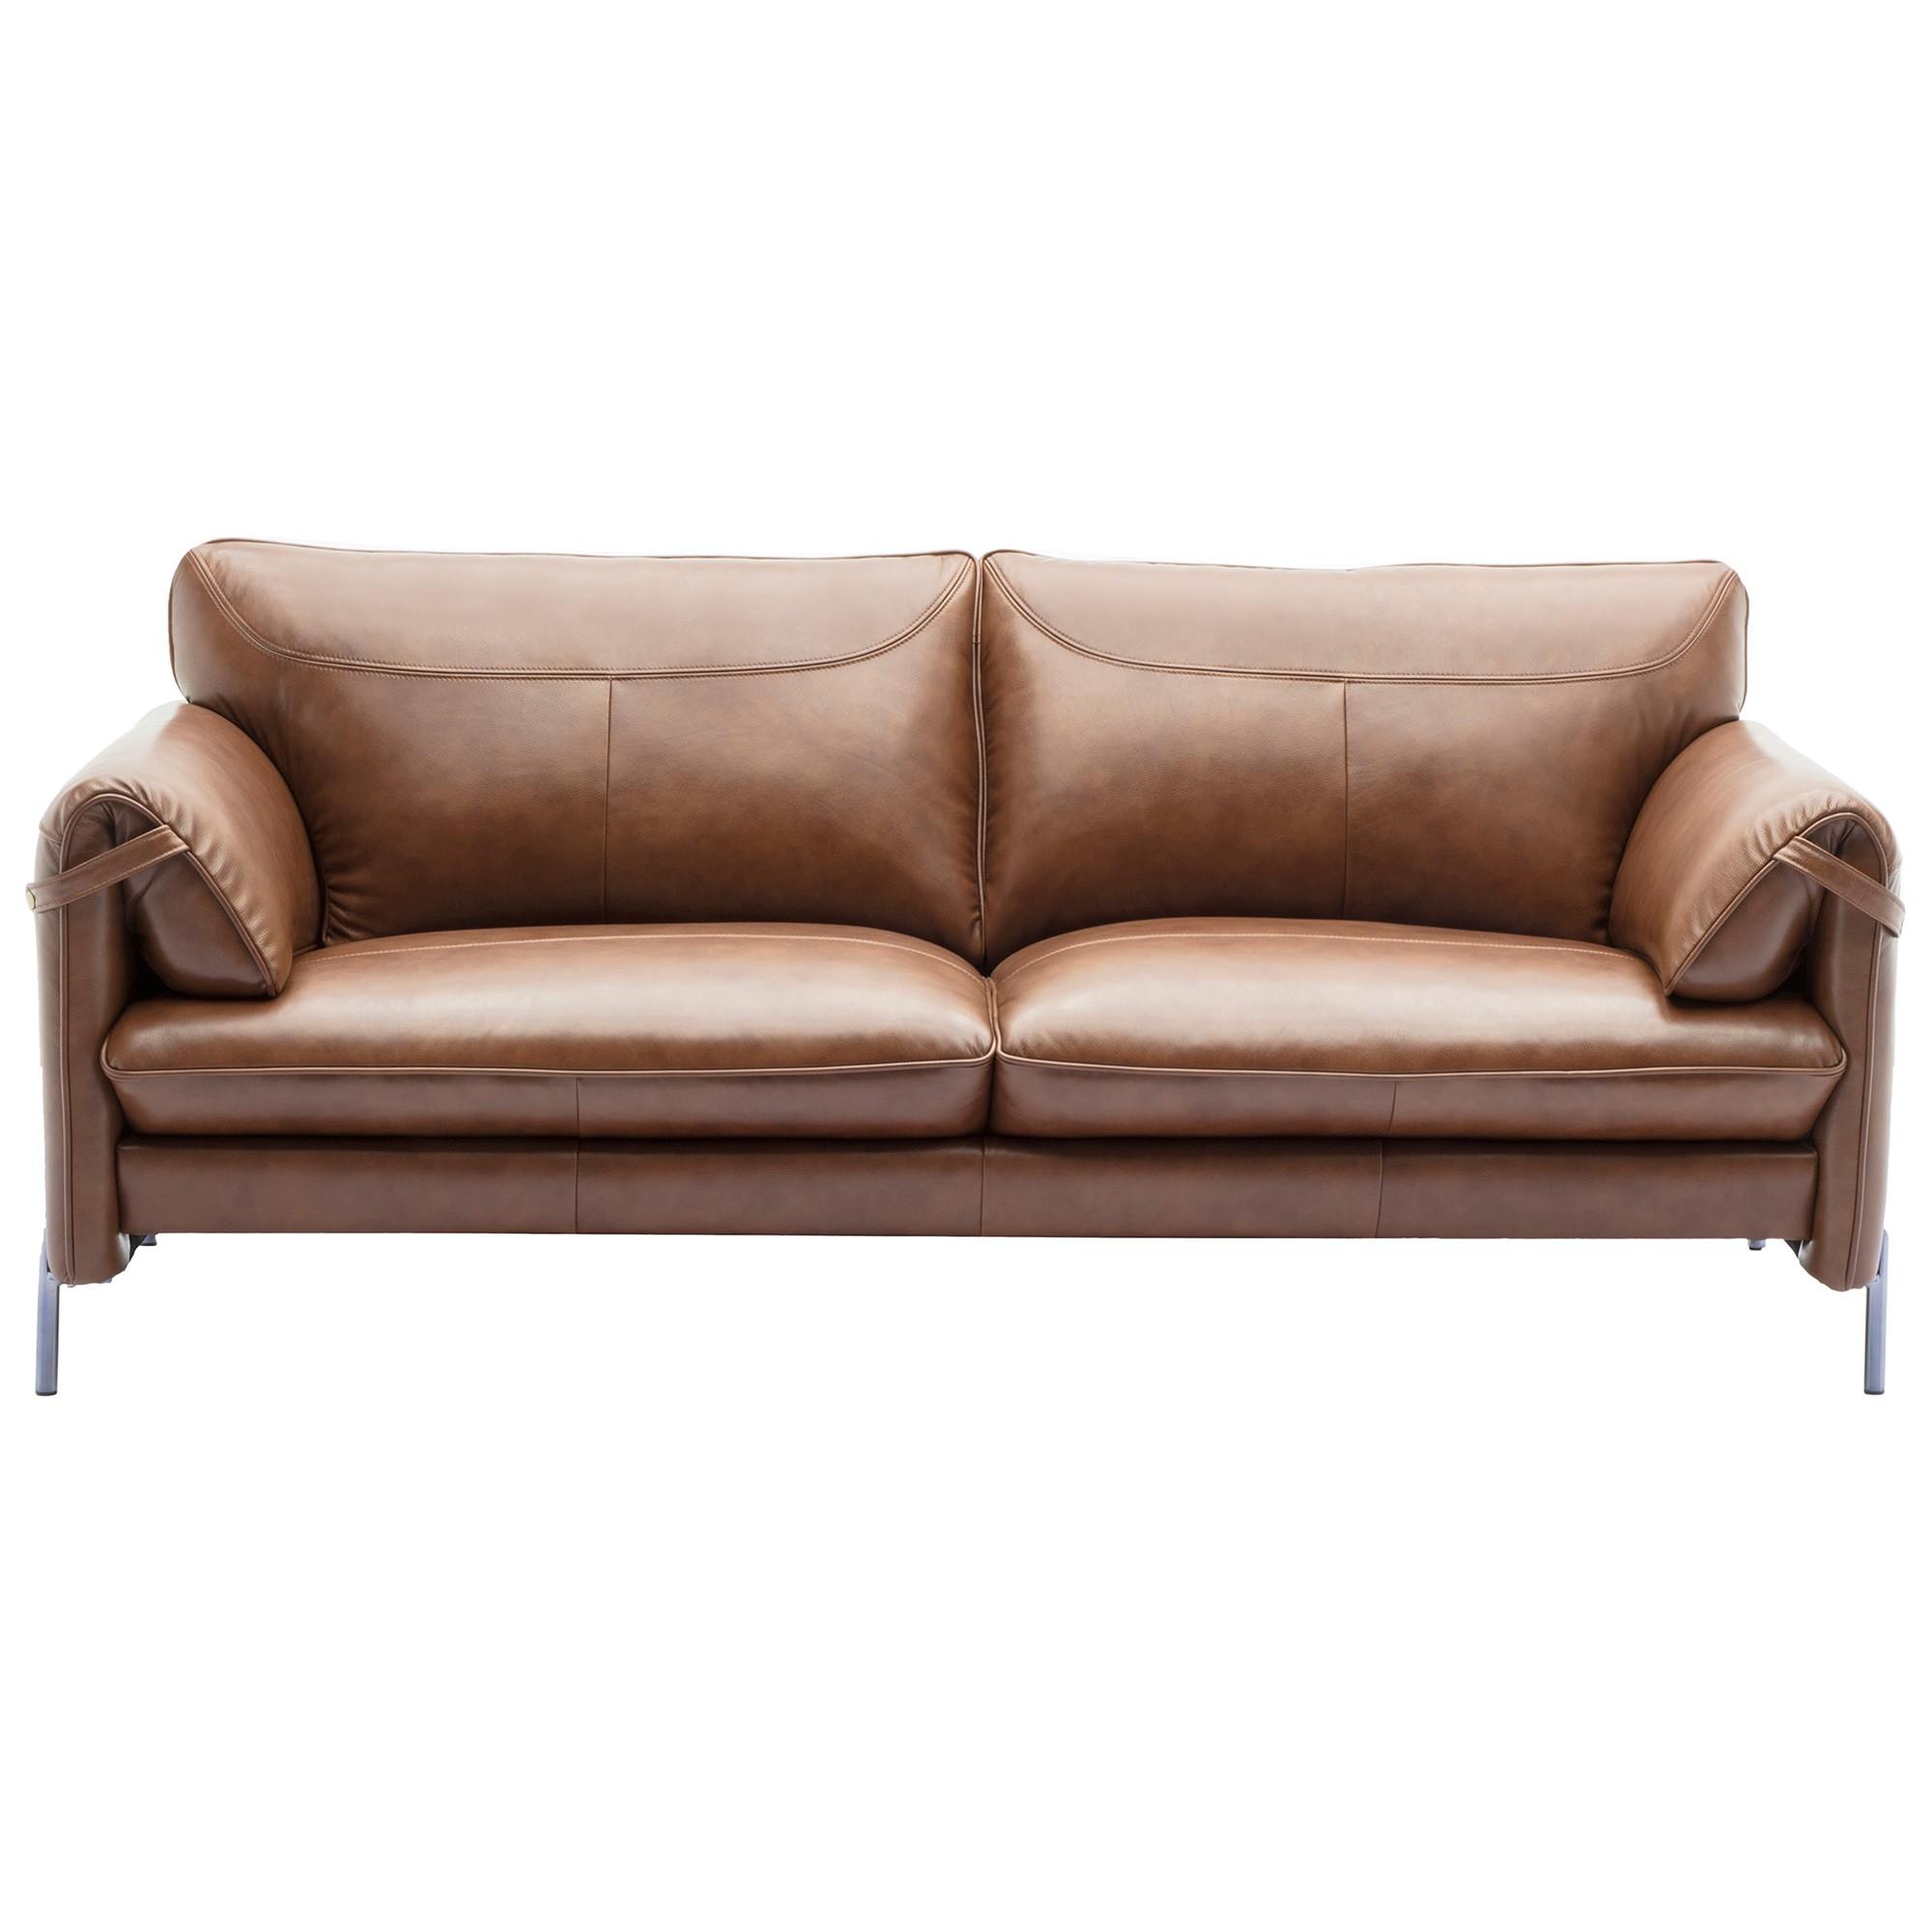 Alverno Leather Sofa, 2.5 Seater